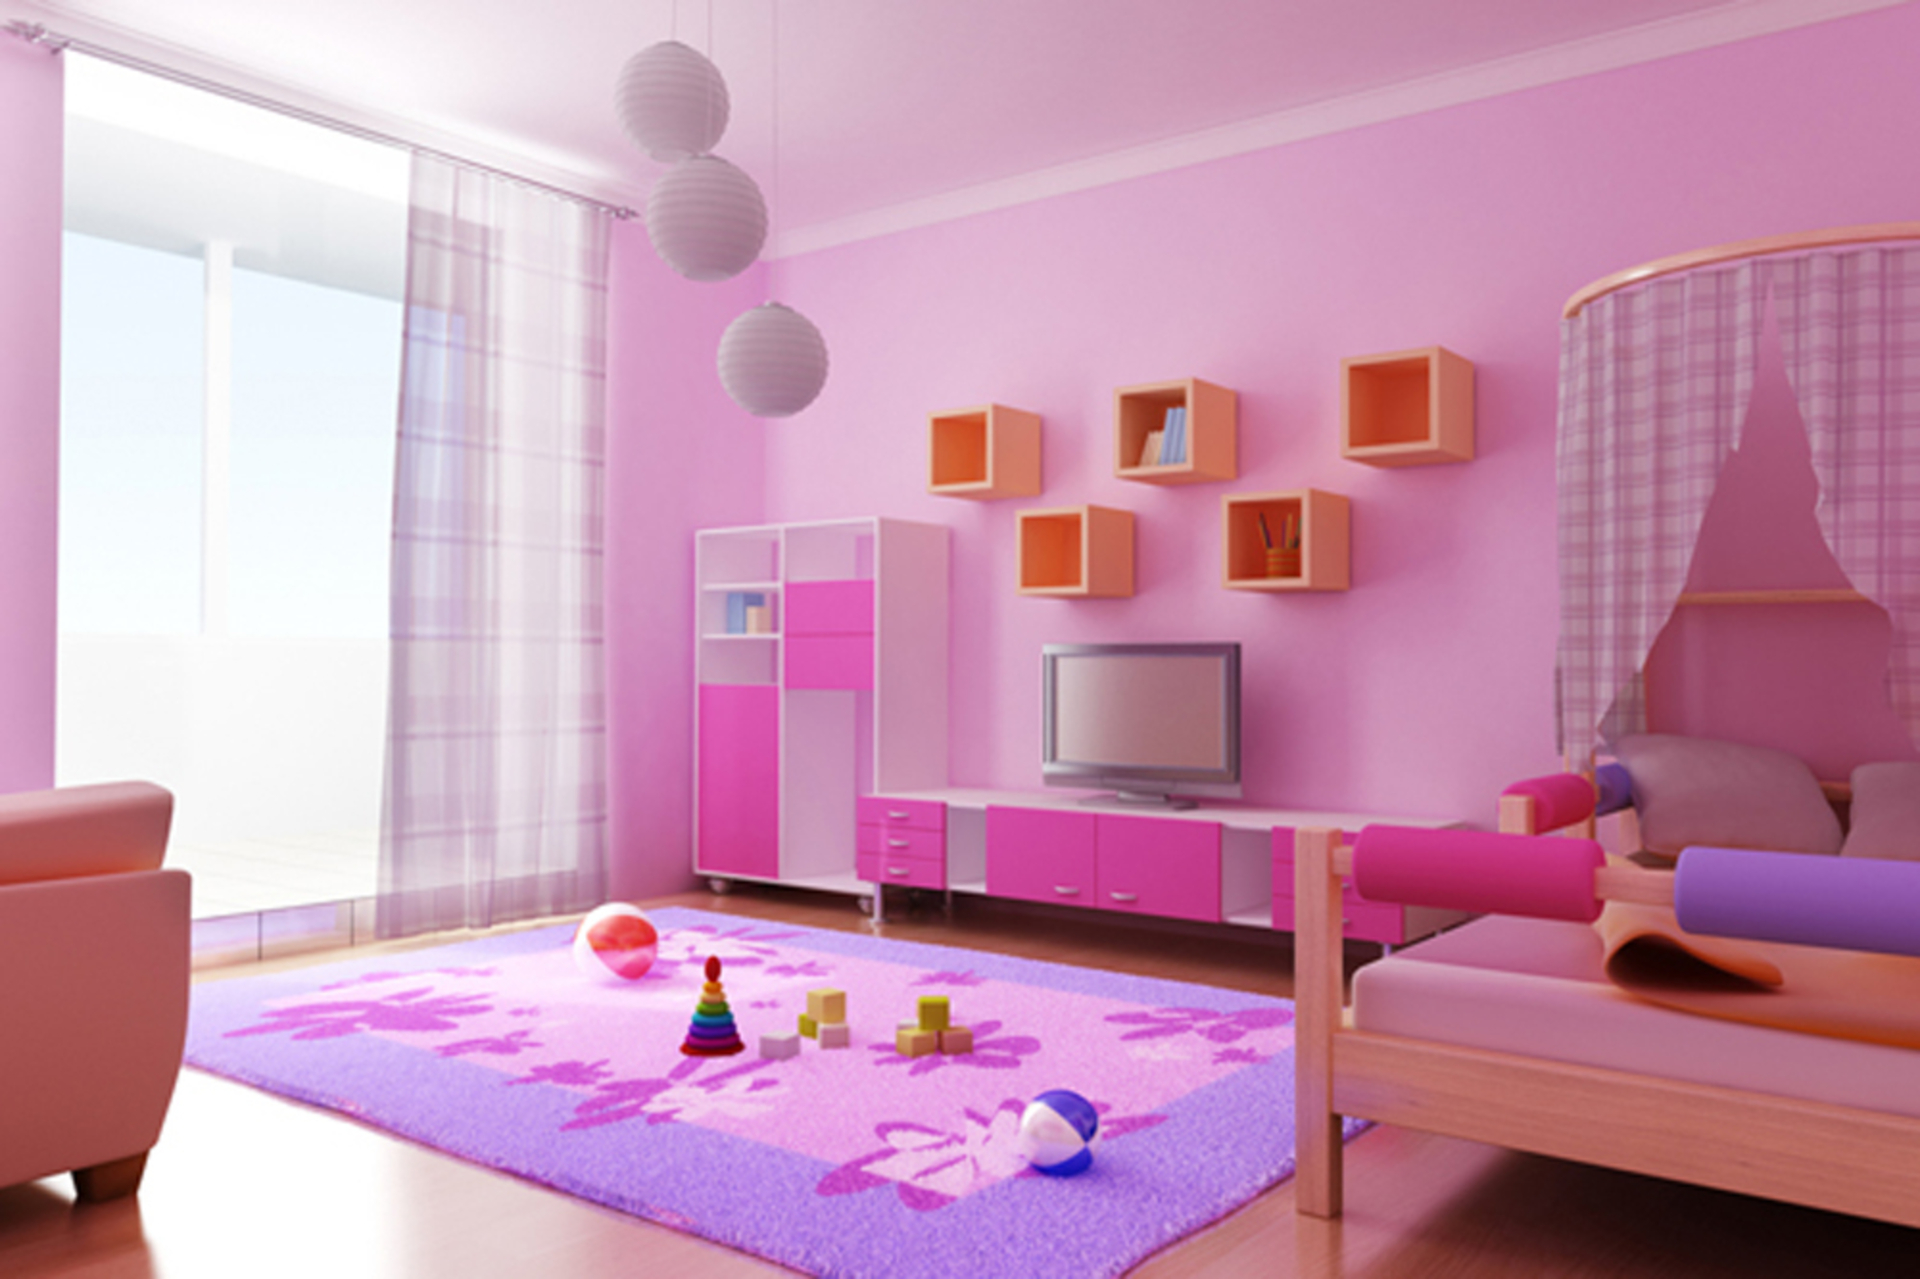 Simple Bedroom Wall Paint Designs best lighting for bedroom. zamp.co